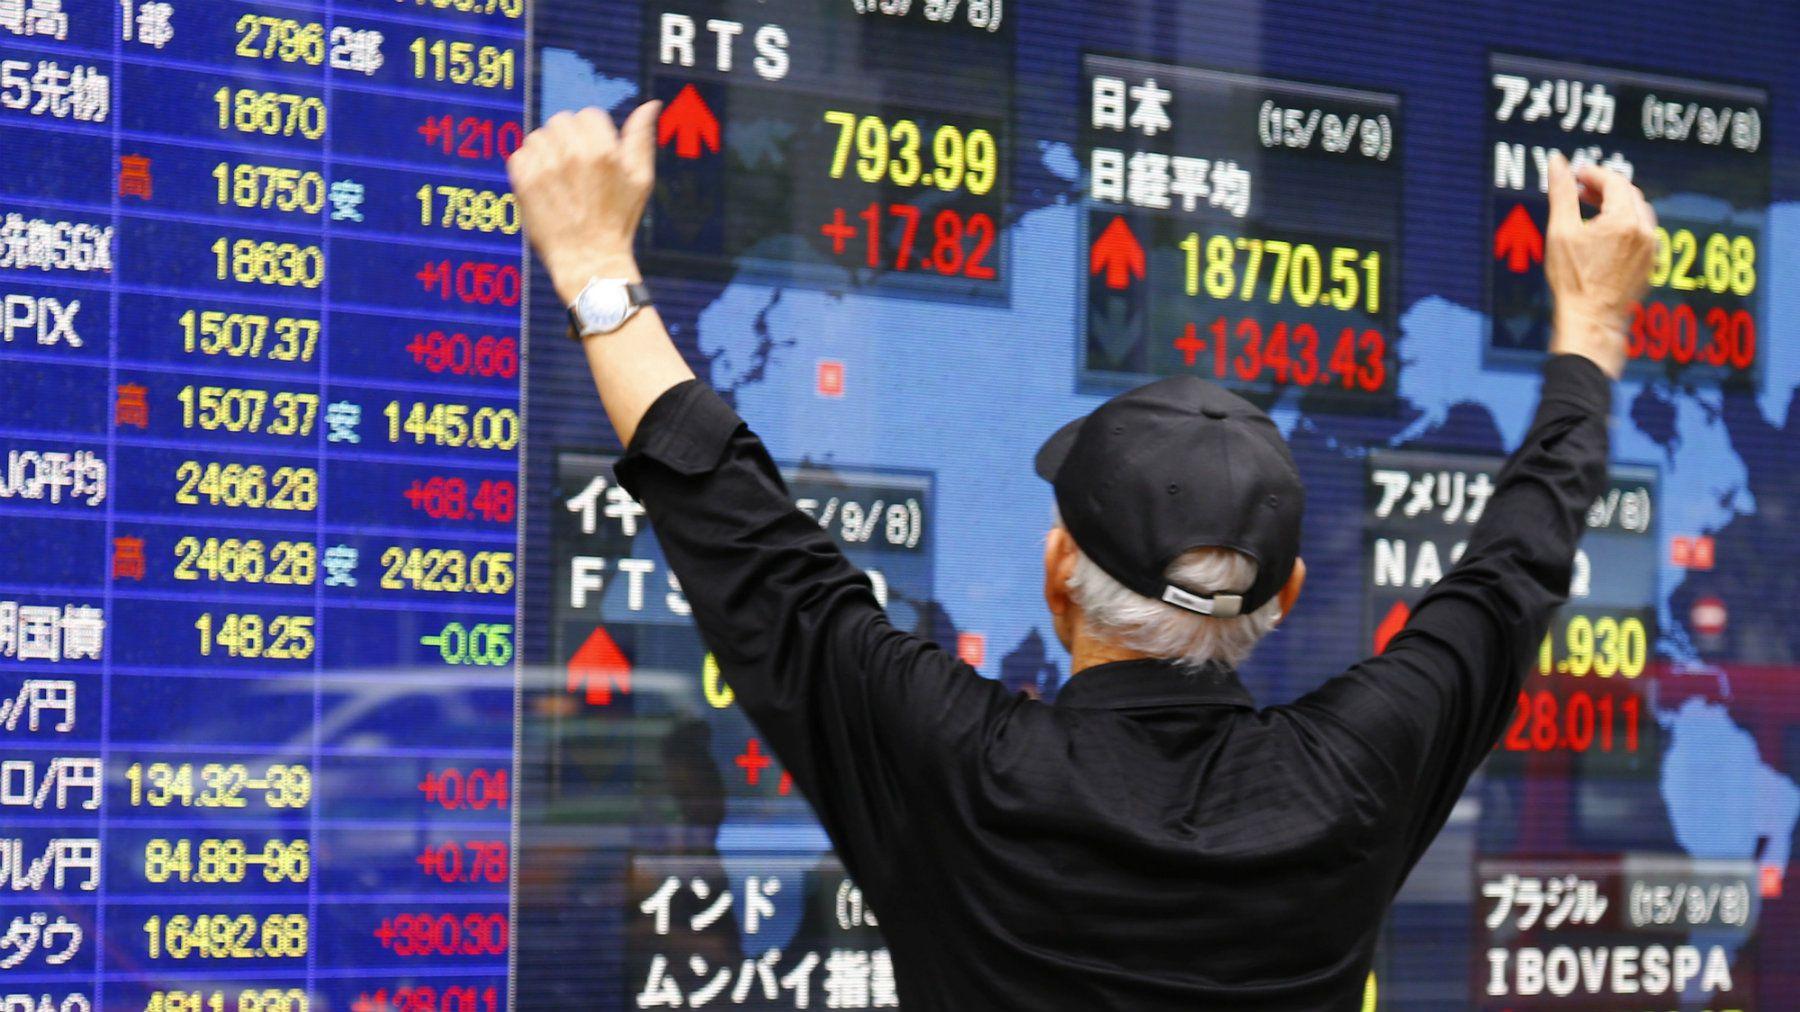 Asian stock market: